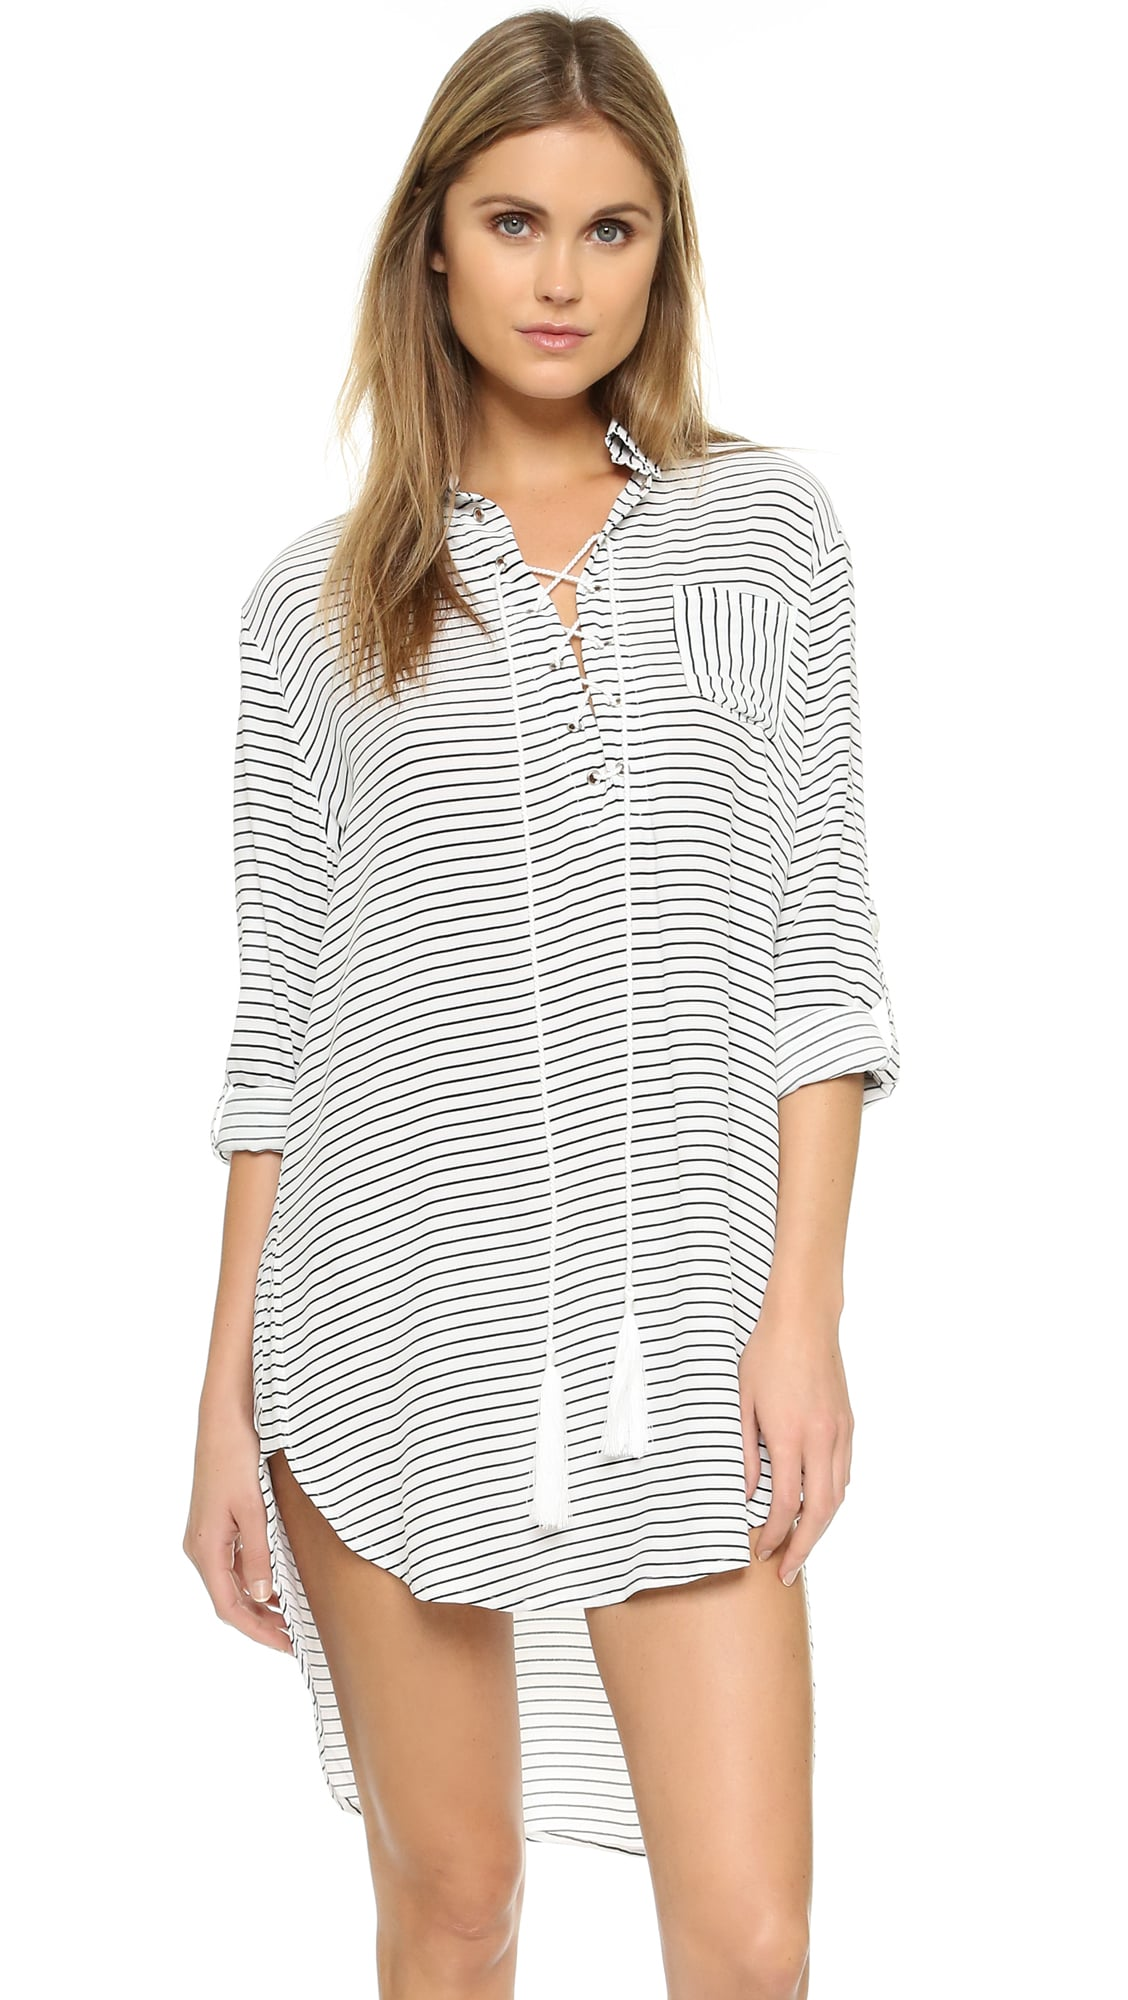 FAITHFULL THE BRAND Walker Shirt Dress ($95, originally $135)